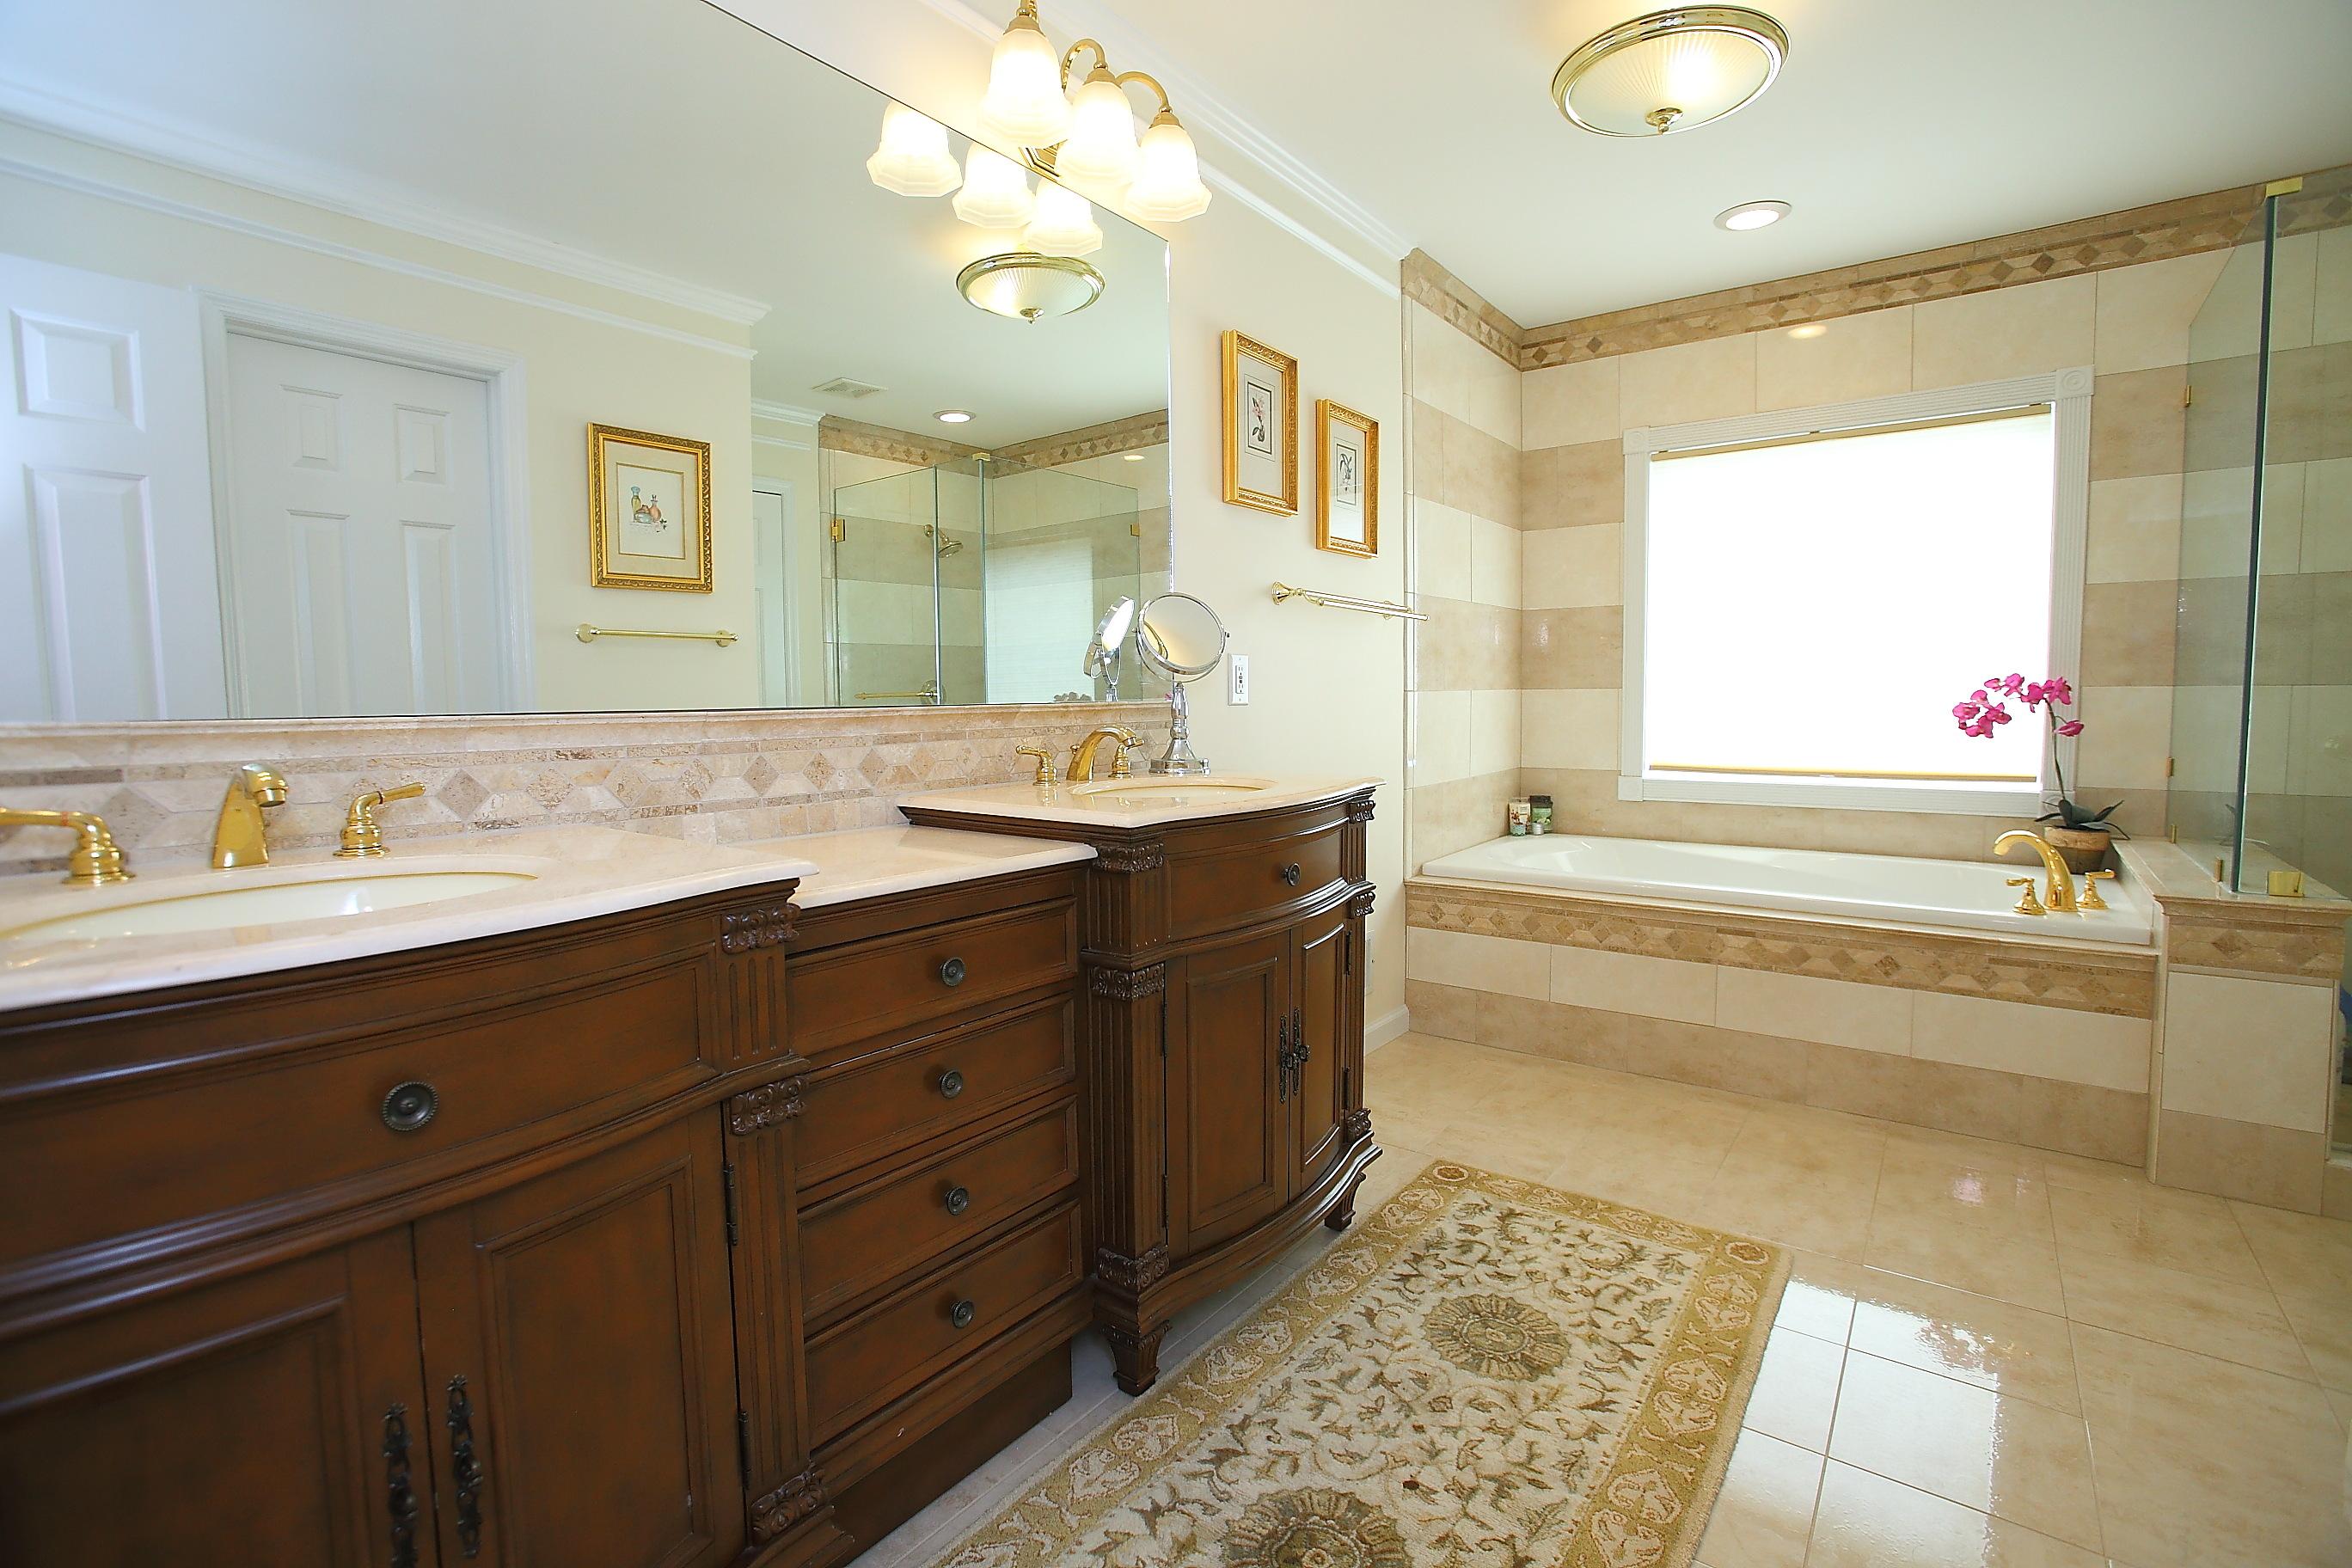 9831 White Blossom Blvd Bathroom